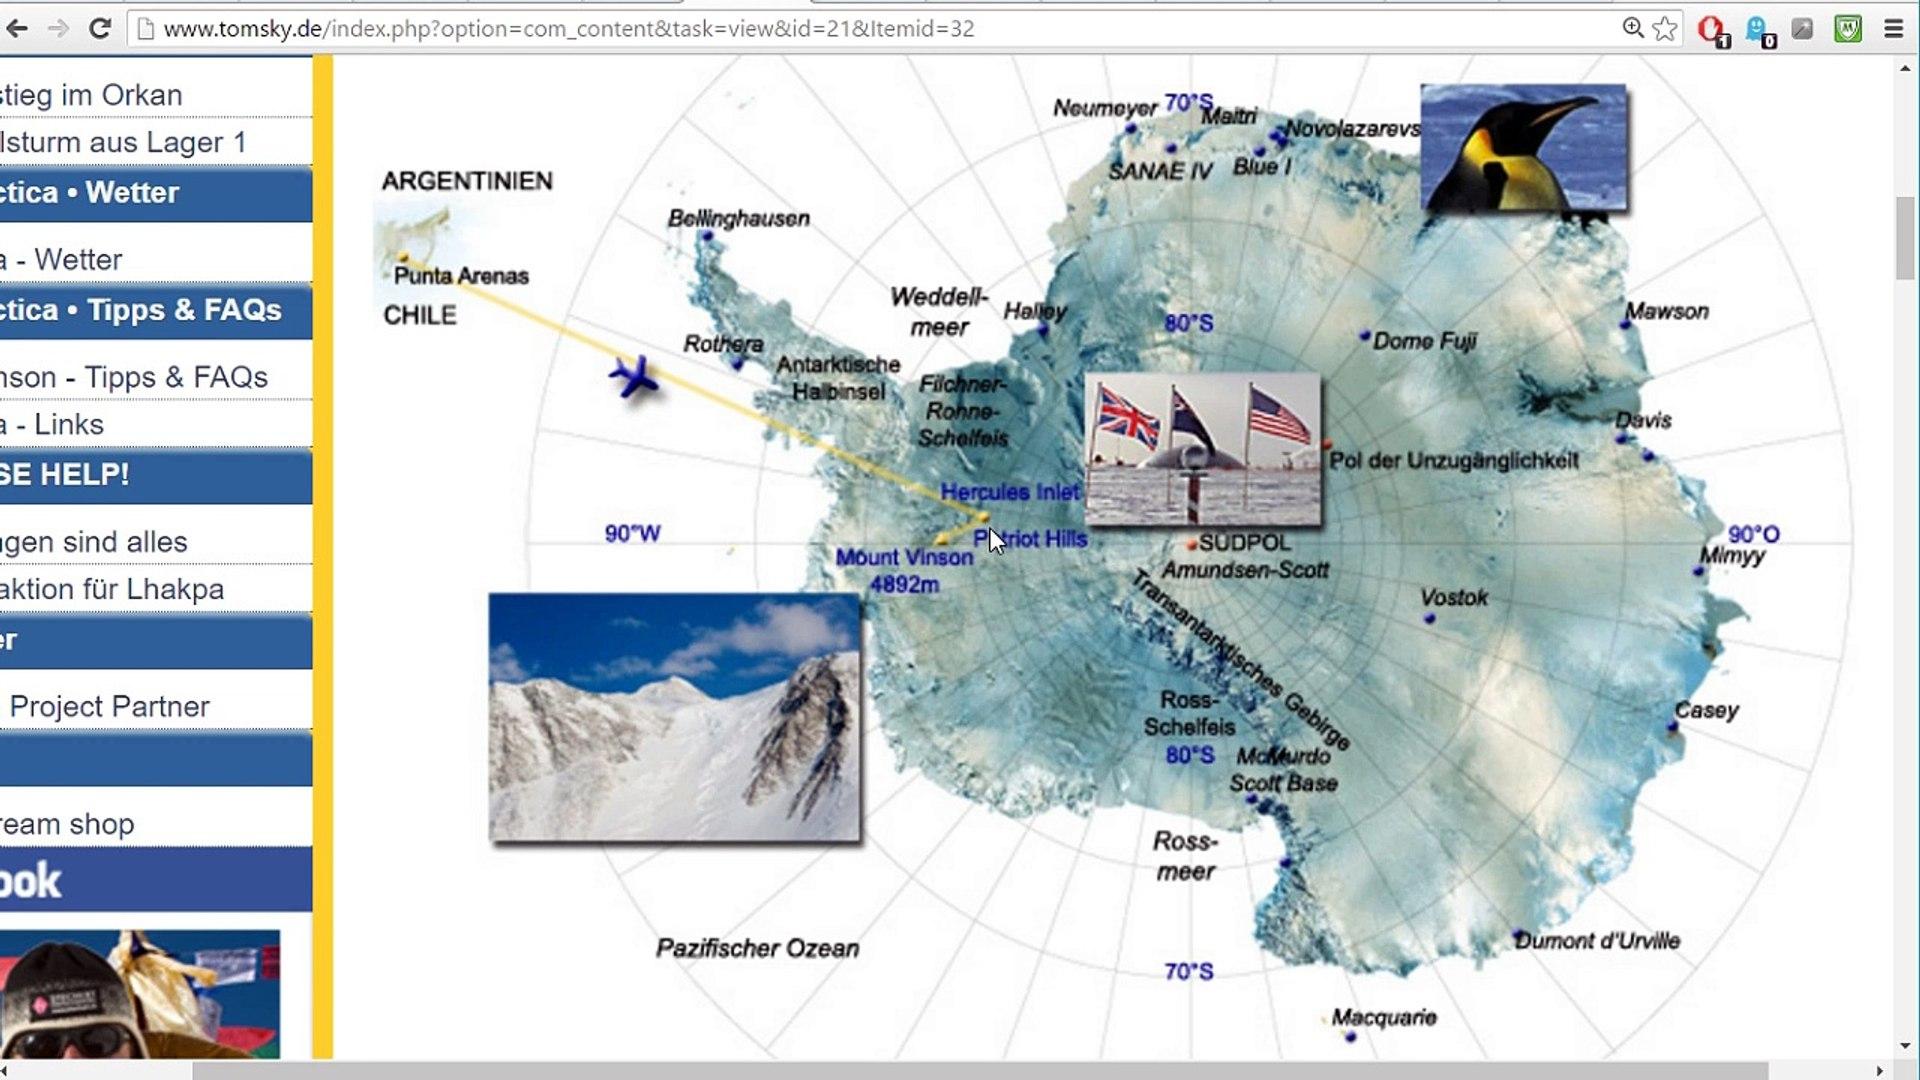 Piri Reis Karte Atlantis.Gibt Es Pyramiden In Der Antarktis Meine Sache Folge 10